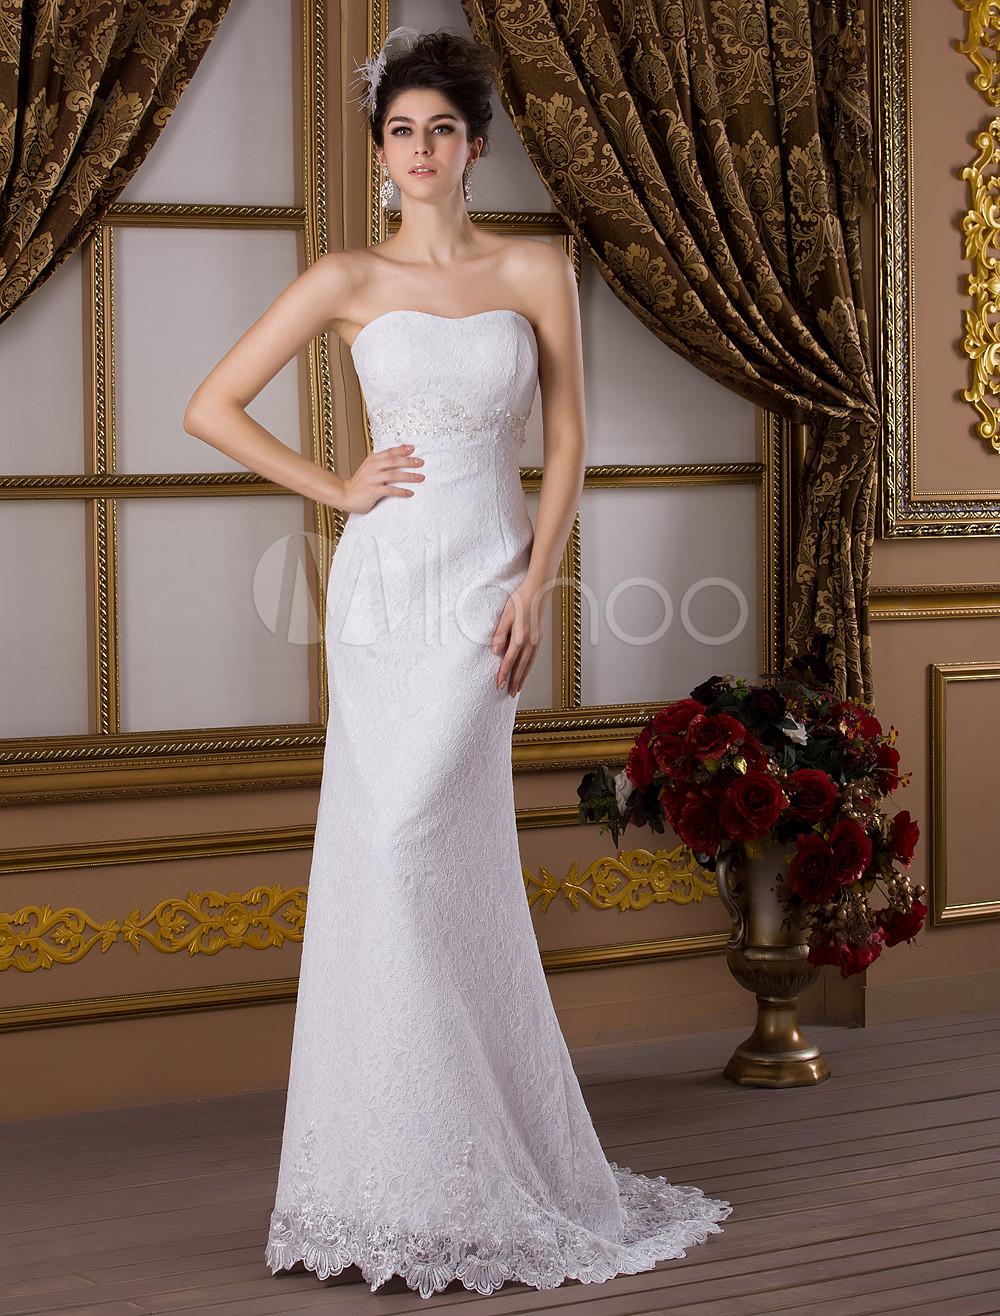 Sweep White Bride's Wedding Dress with Sweetheart Neck Mermaid Beading